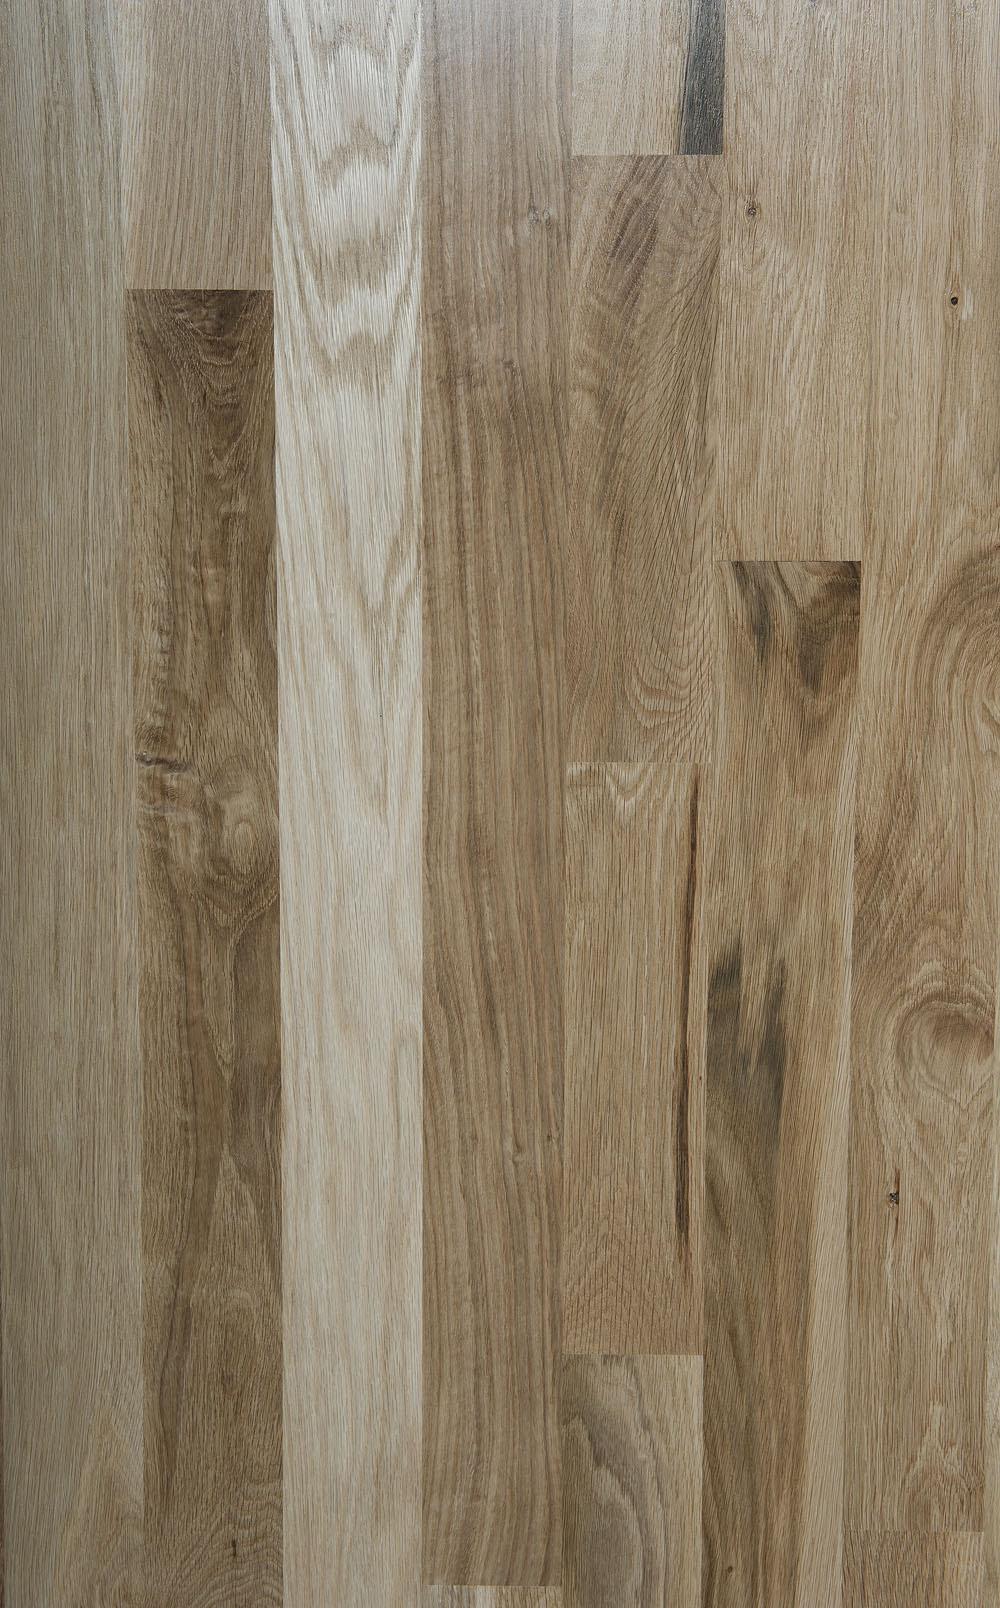 Unfinished White Oak Boardwalk Hardwood Floors